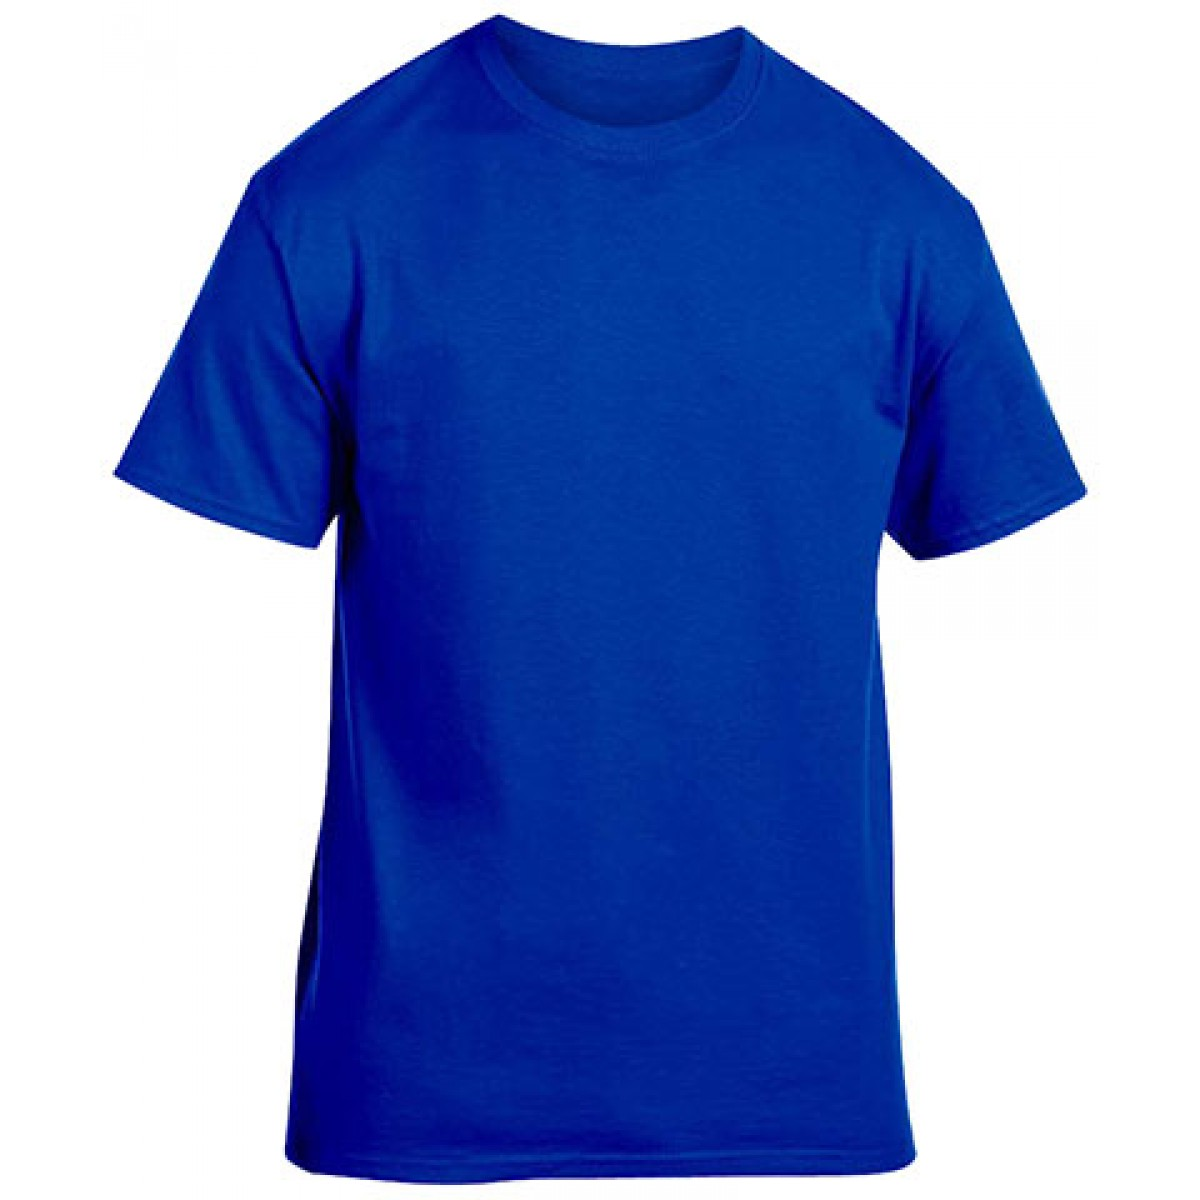 Heavy Cotton Activewear T-Shirt-Royal Blue-XL